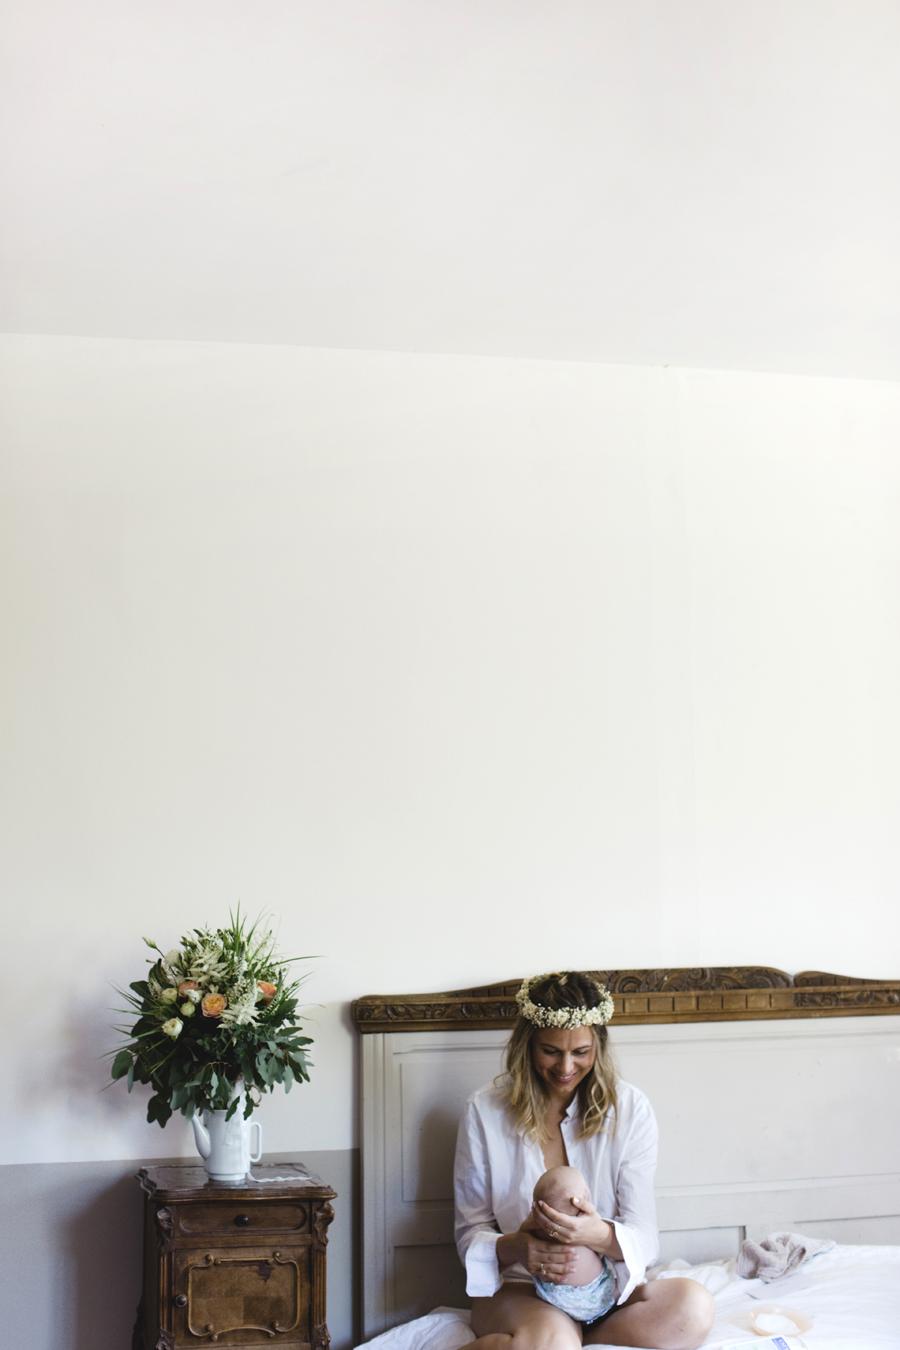 celine_marks_mariage_aurelie_keil_23